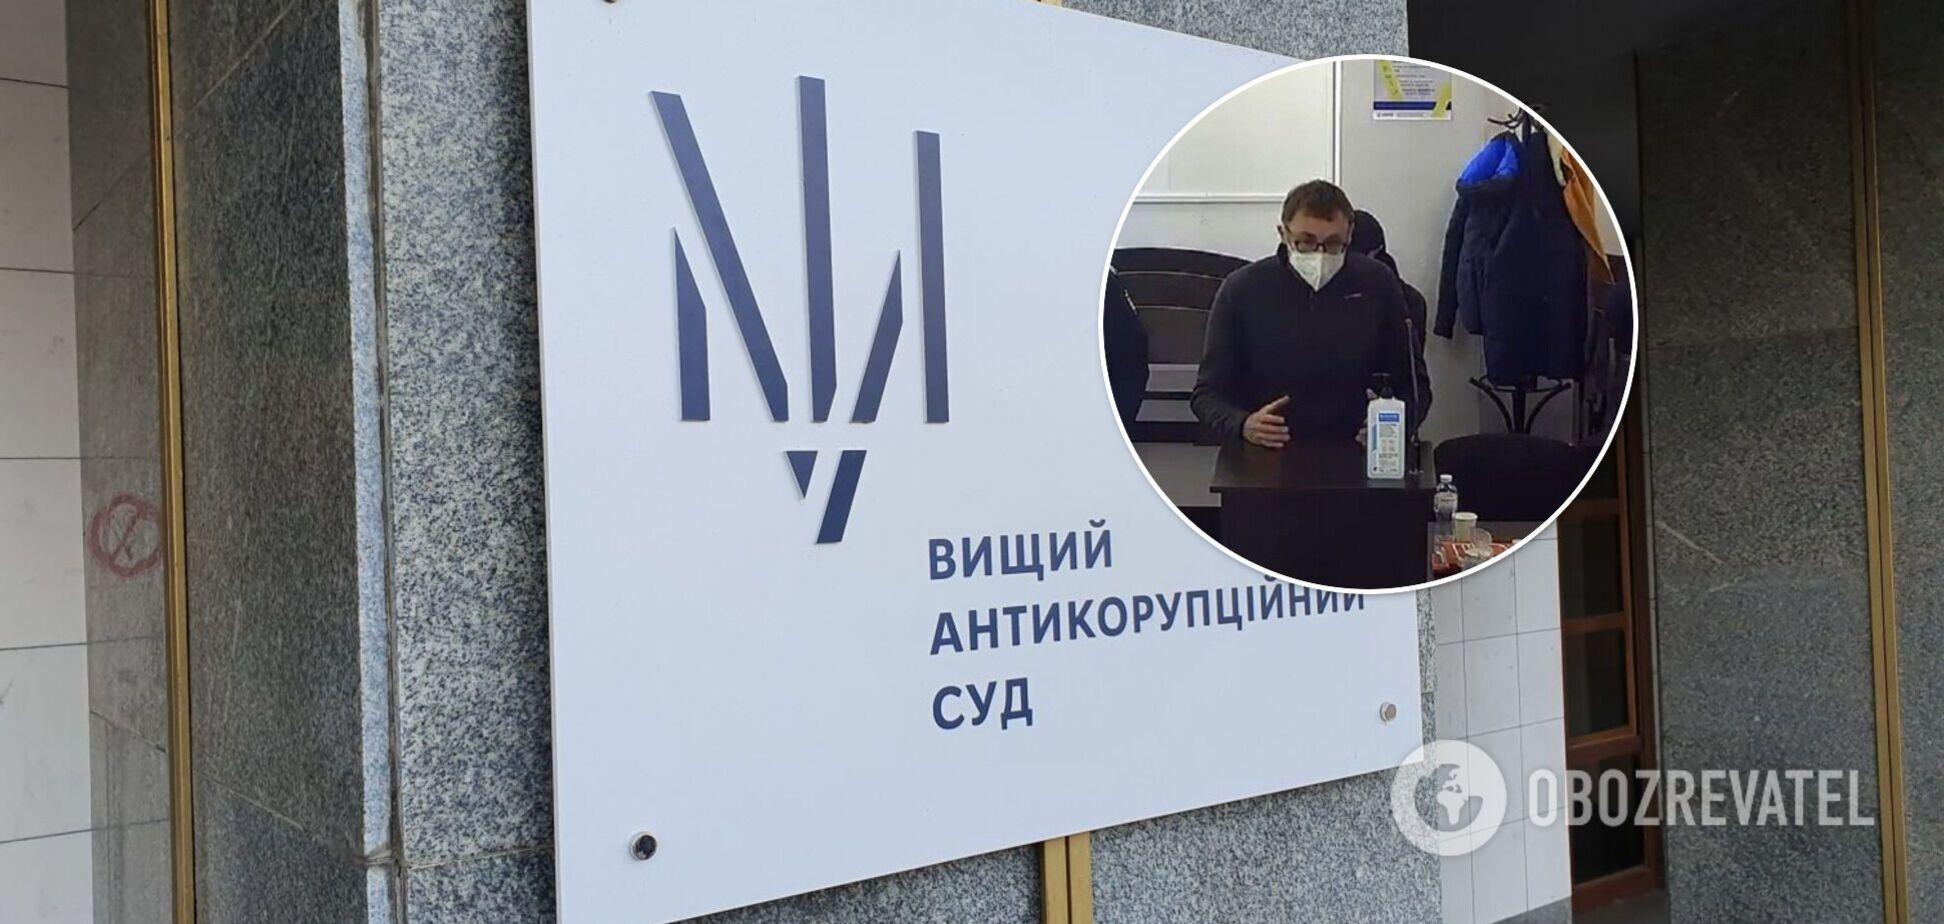 За адвоката, арестованного по делу брата судьи Вовка, внесли залог